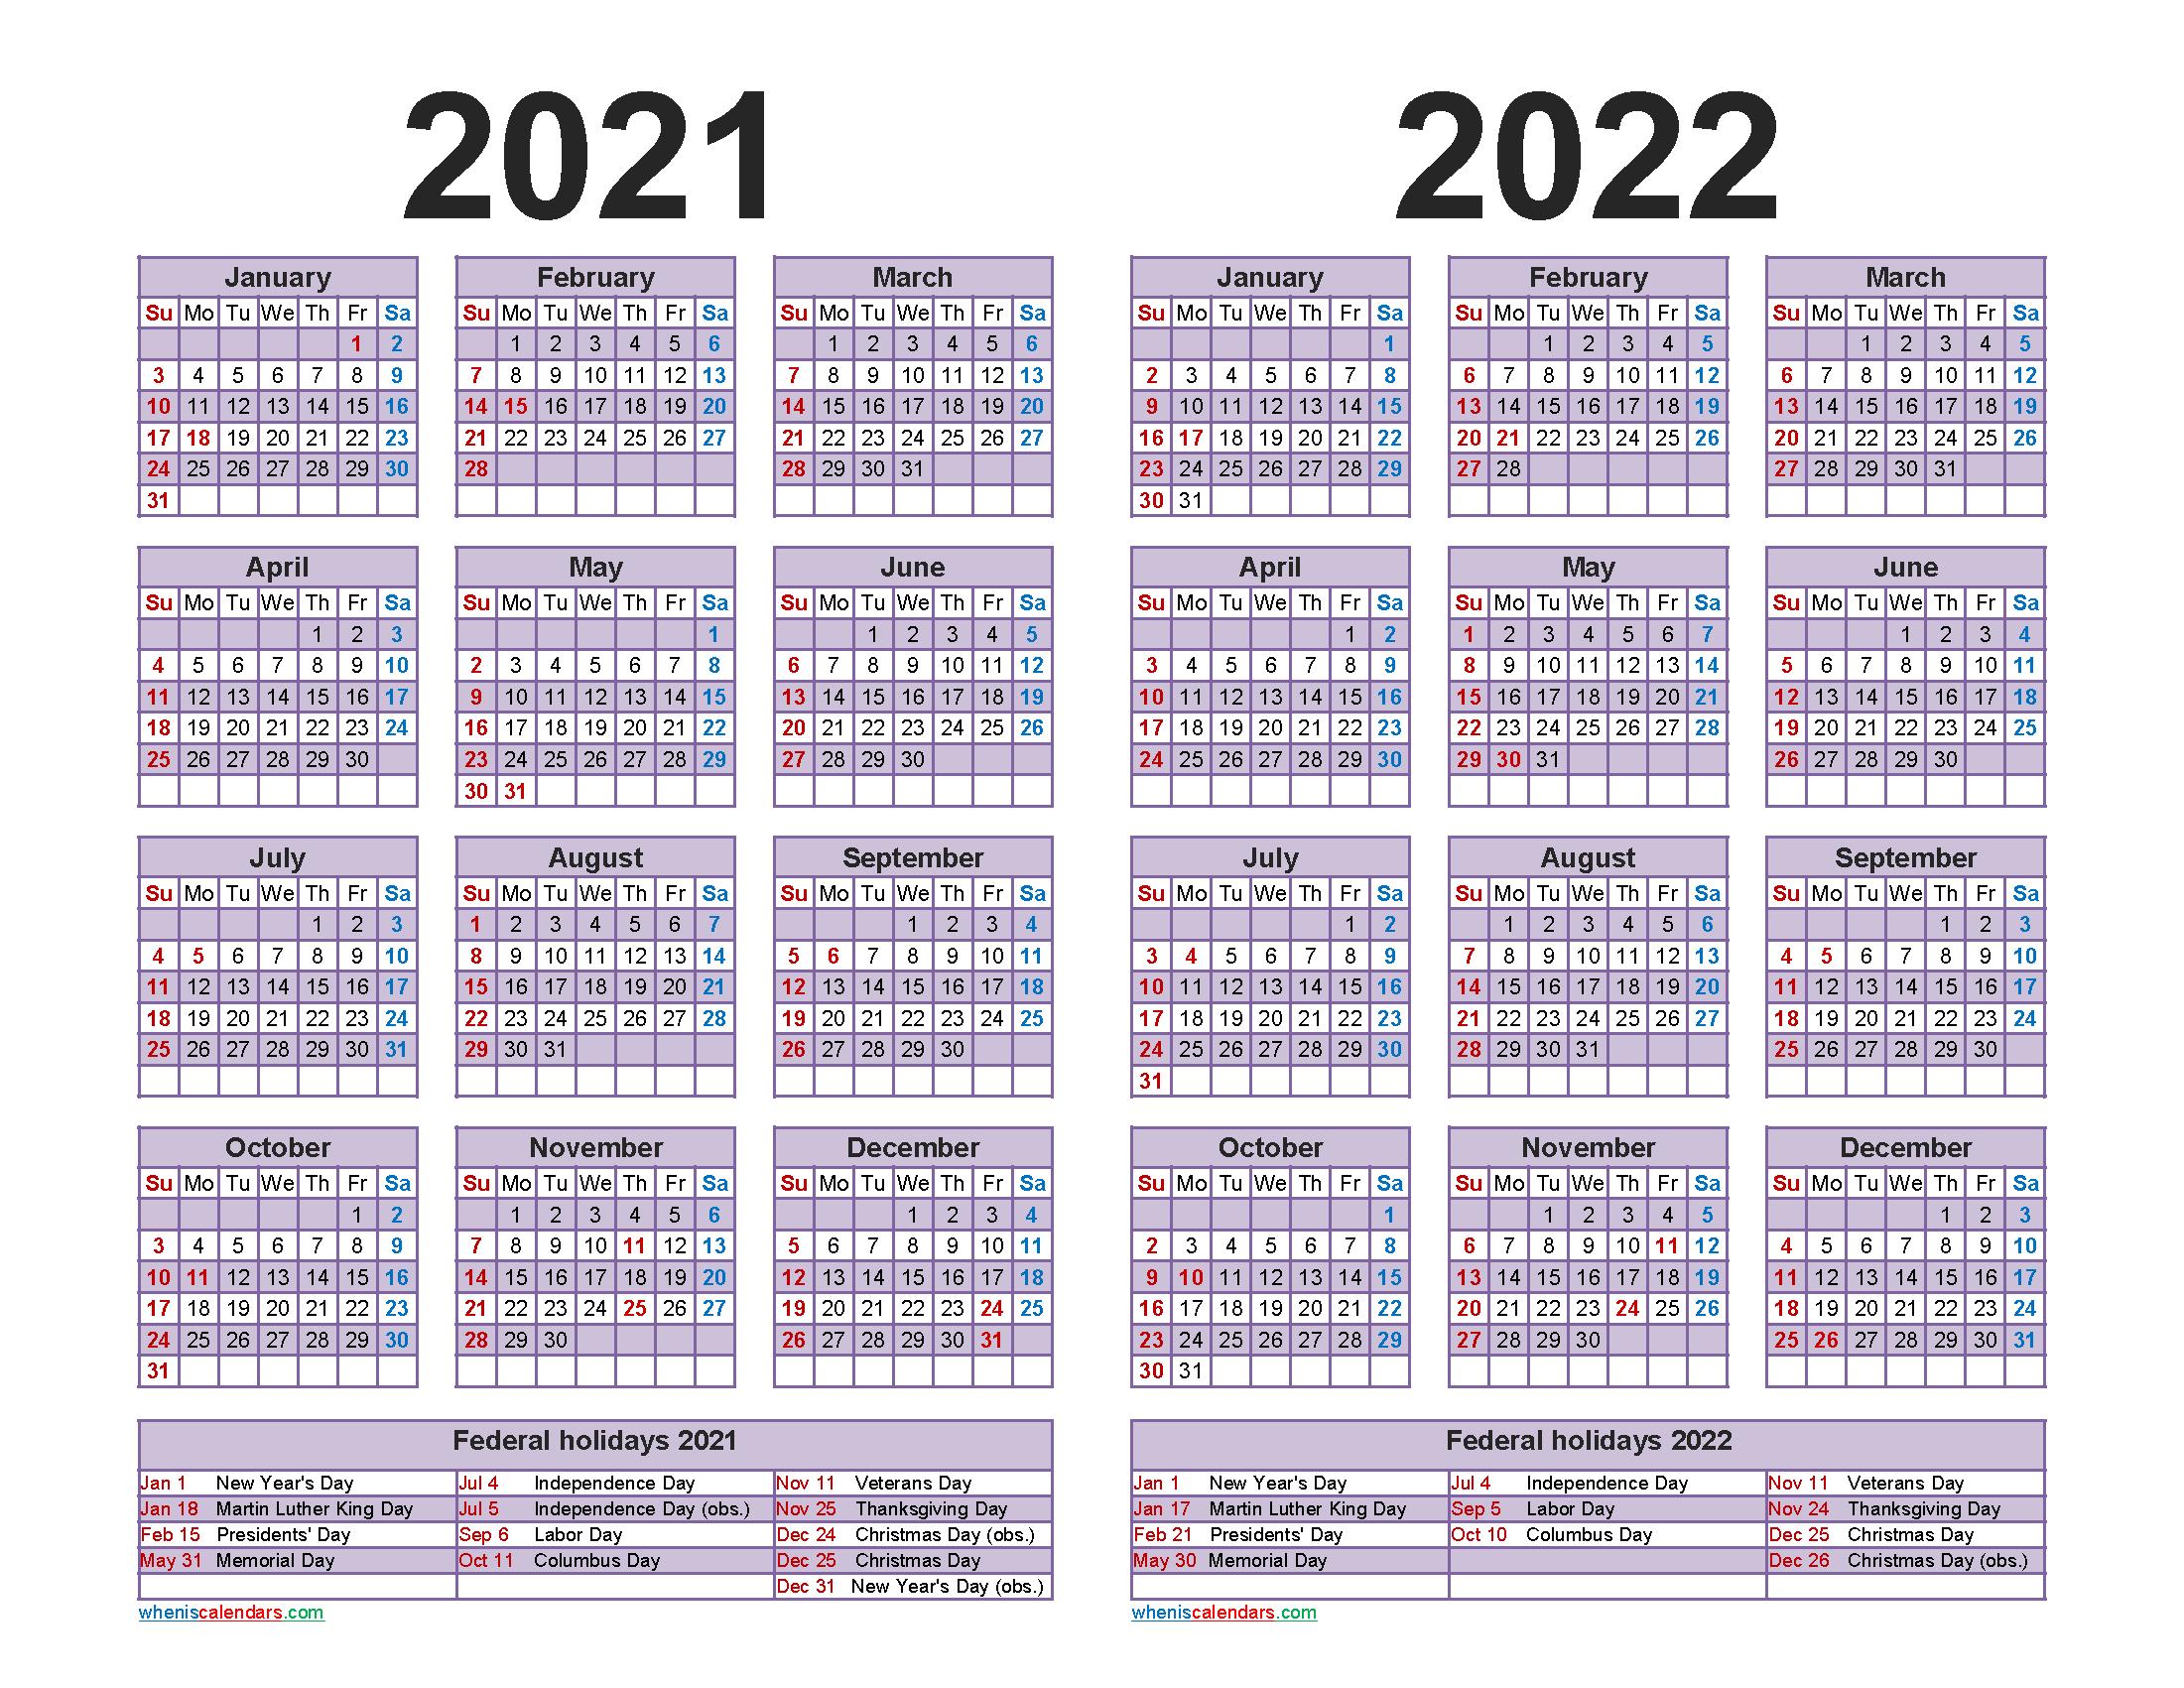 Free 2021 and 2022 Calendar Printable with Holidays